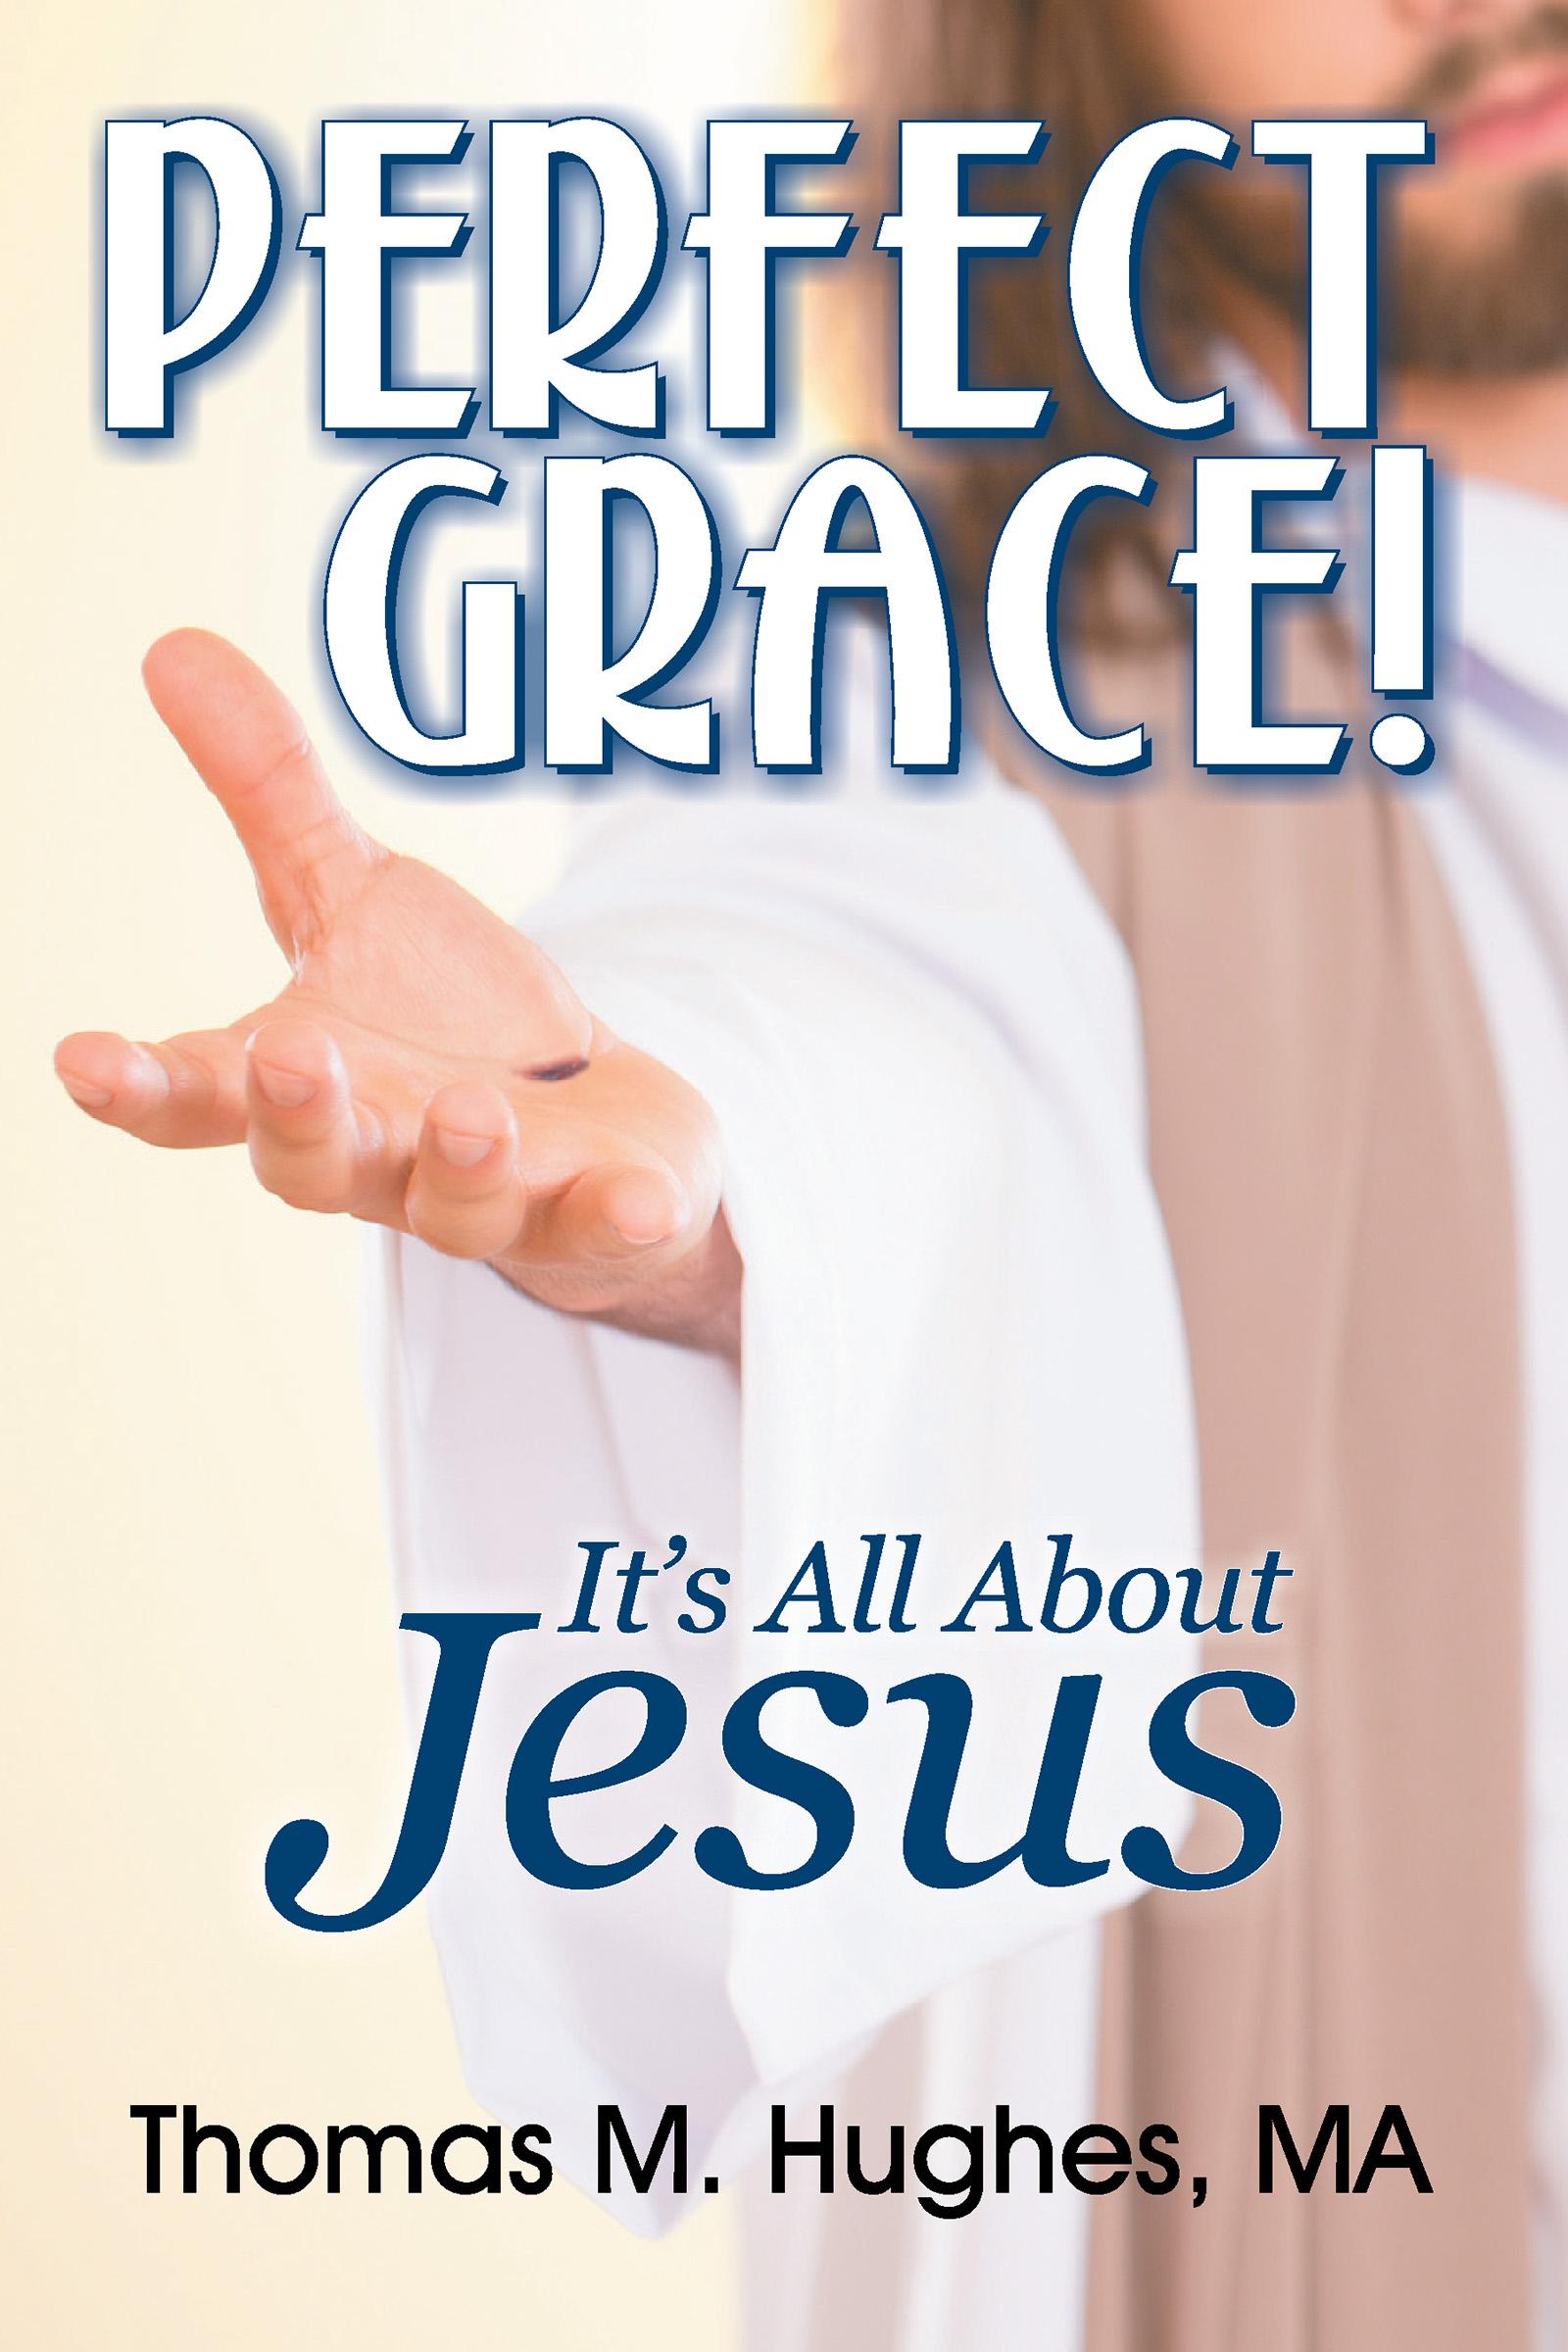 Perfect Grace!